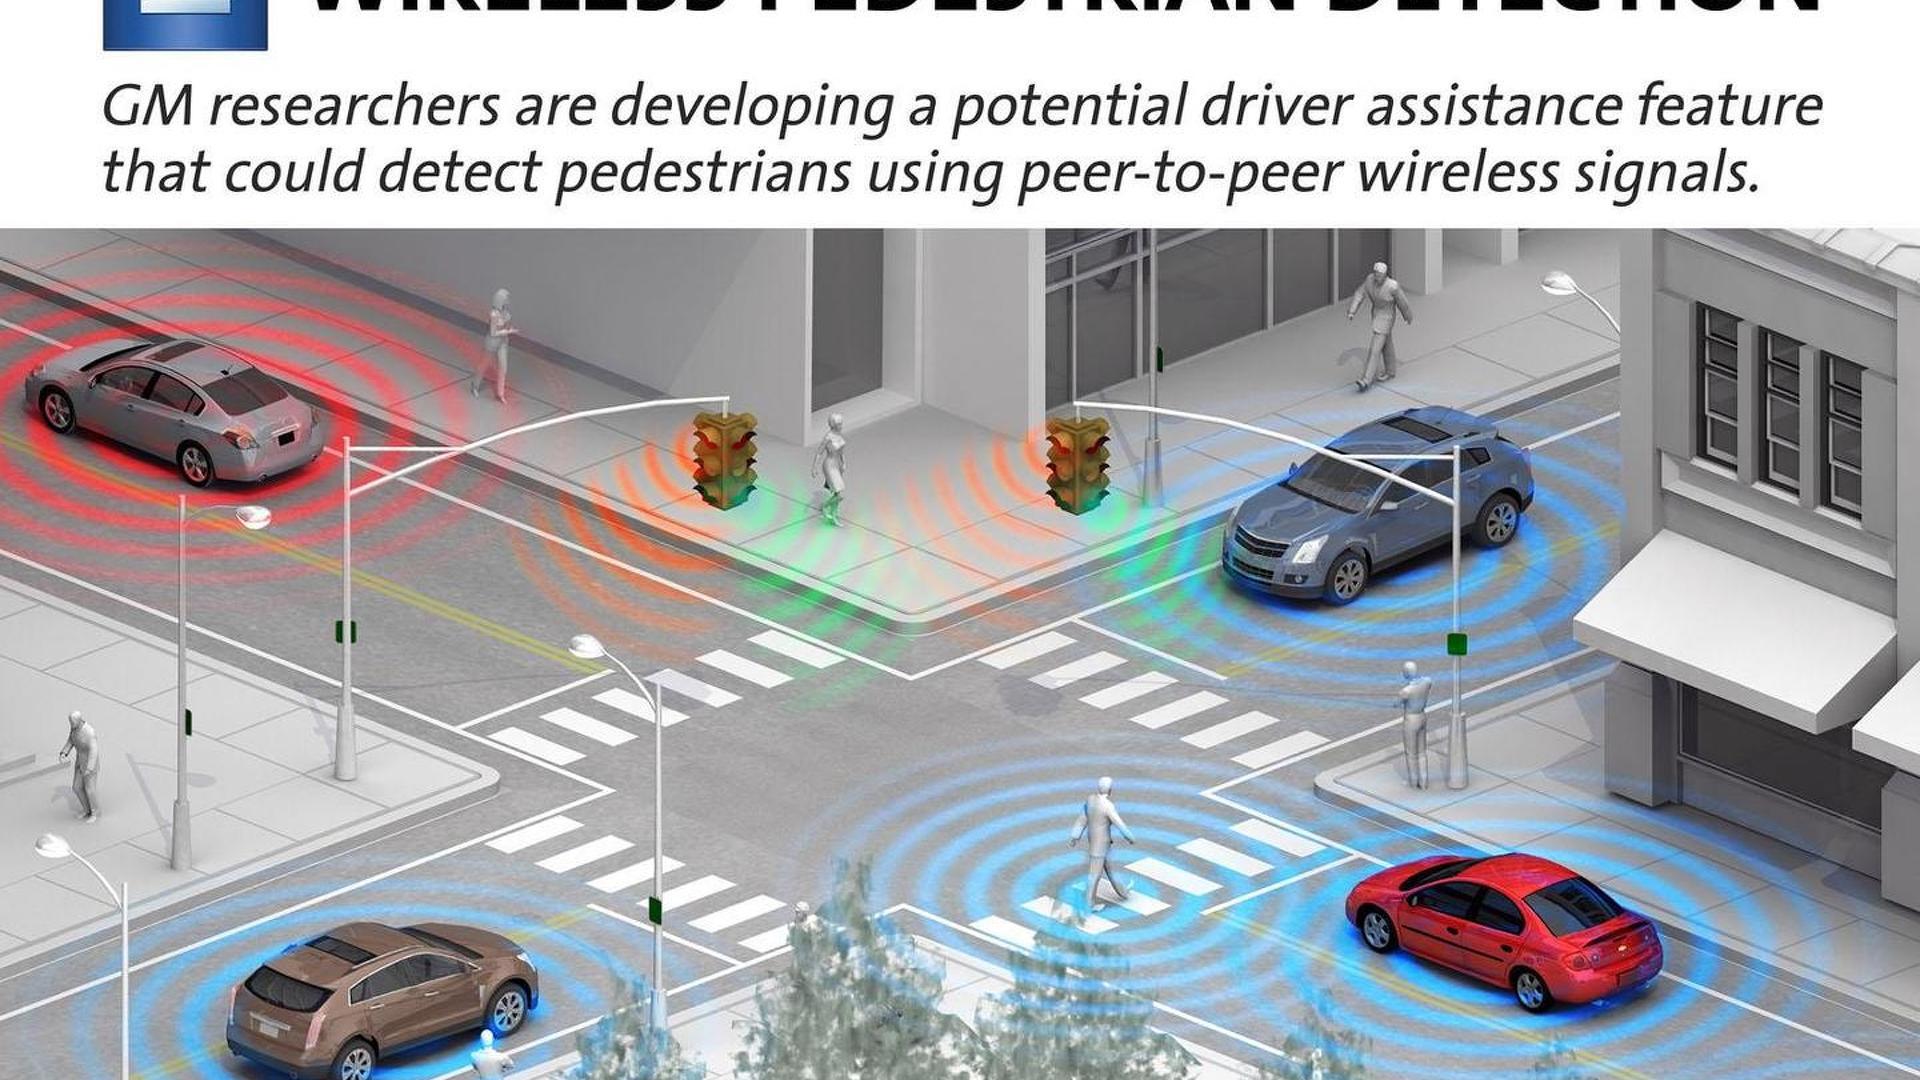 GM developing wireless pedestrian detection system [video]